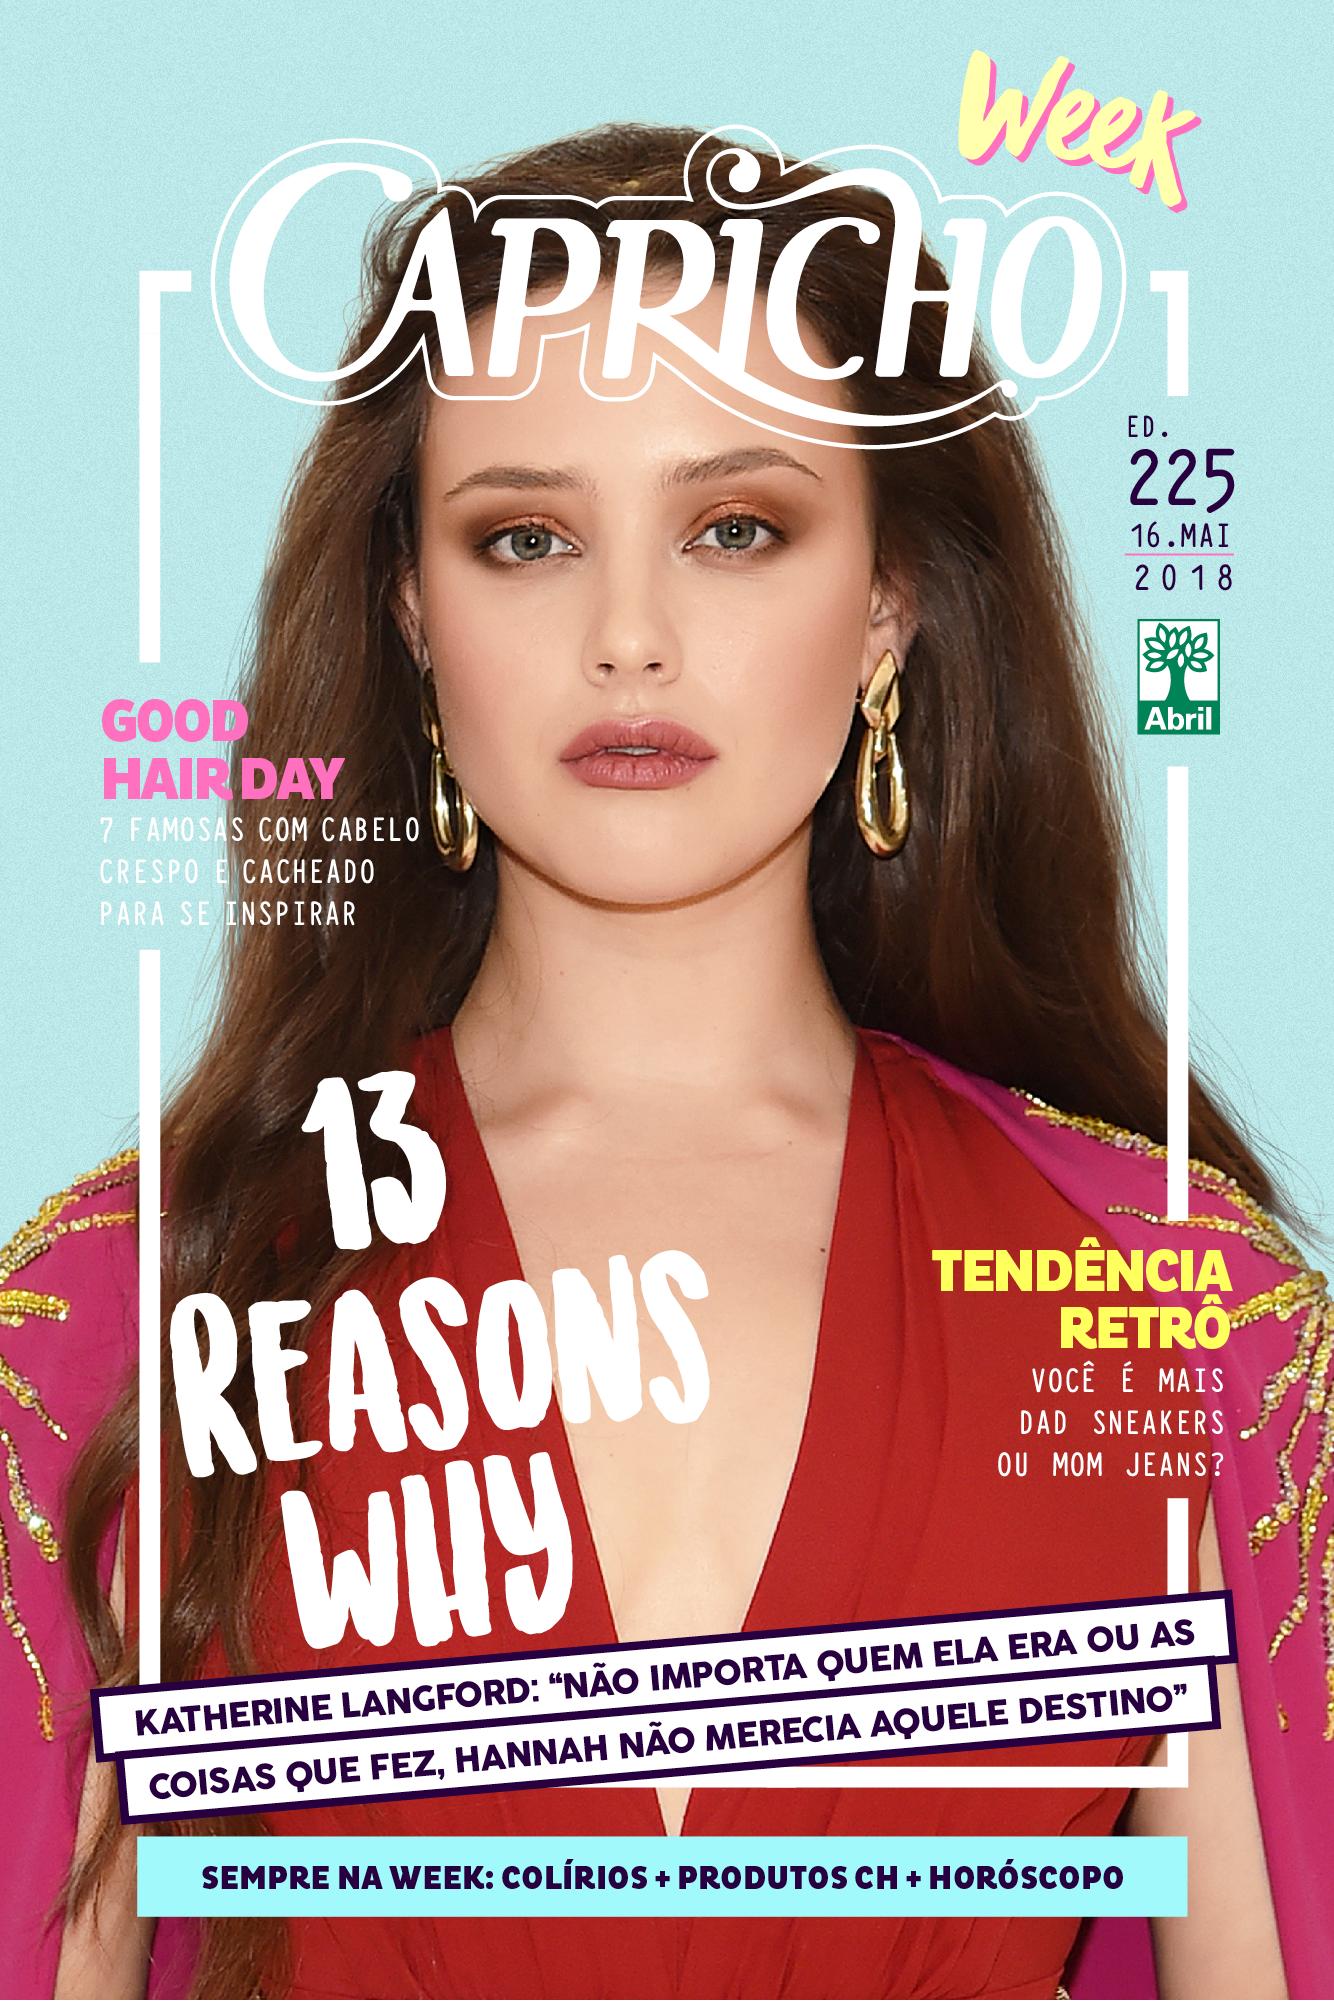 Katherine Langford está linda na capa da CH WEEK!